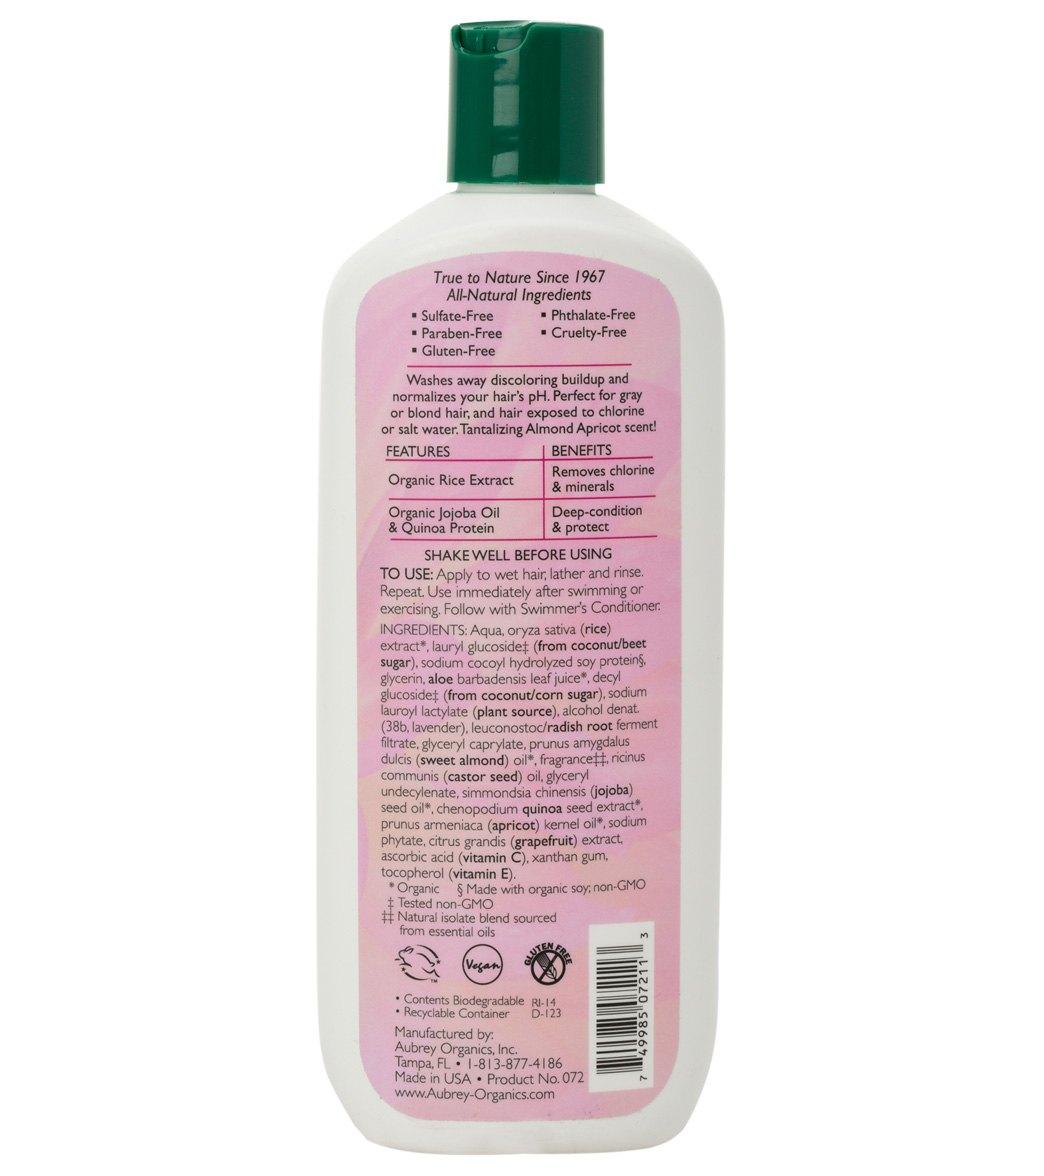 Aubrey Organics Swimmers Shampoo At Swimoutlet